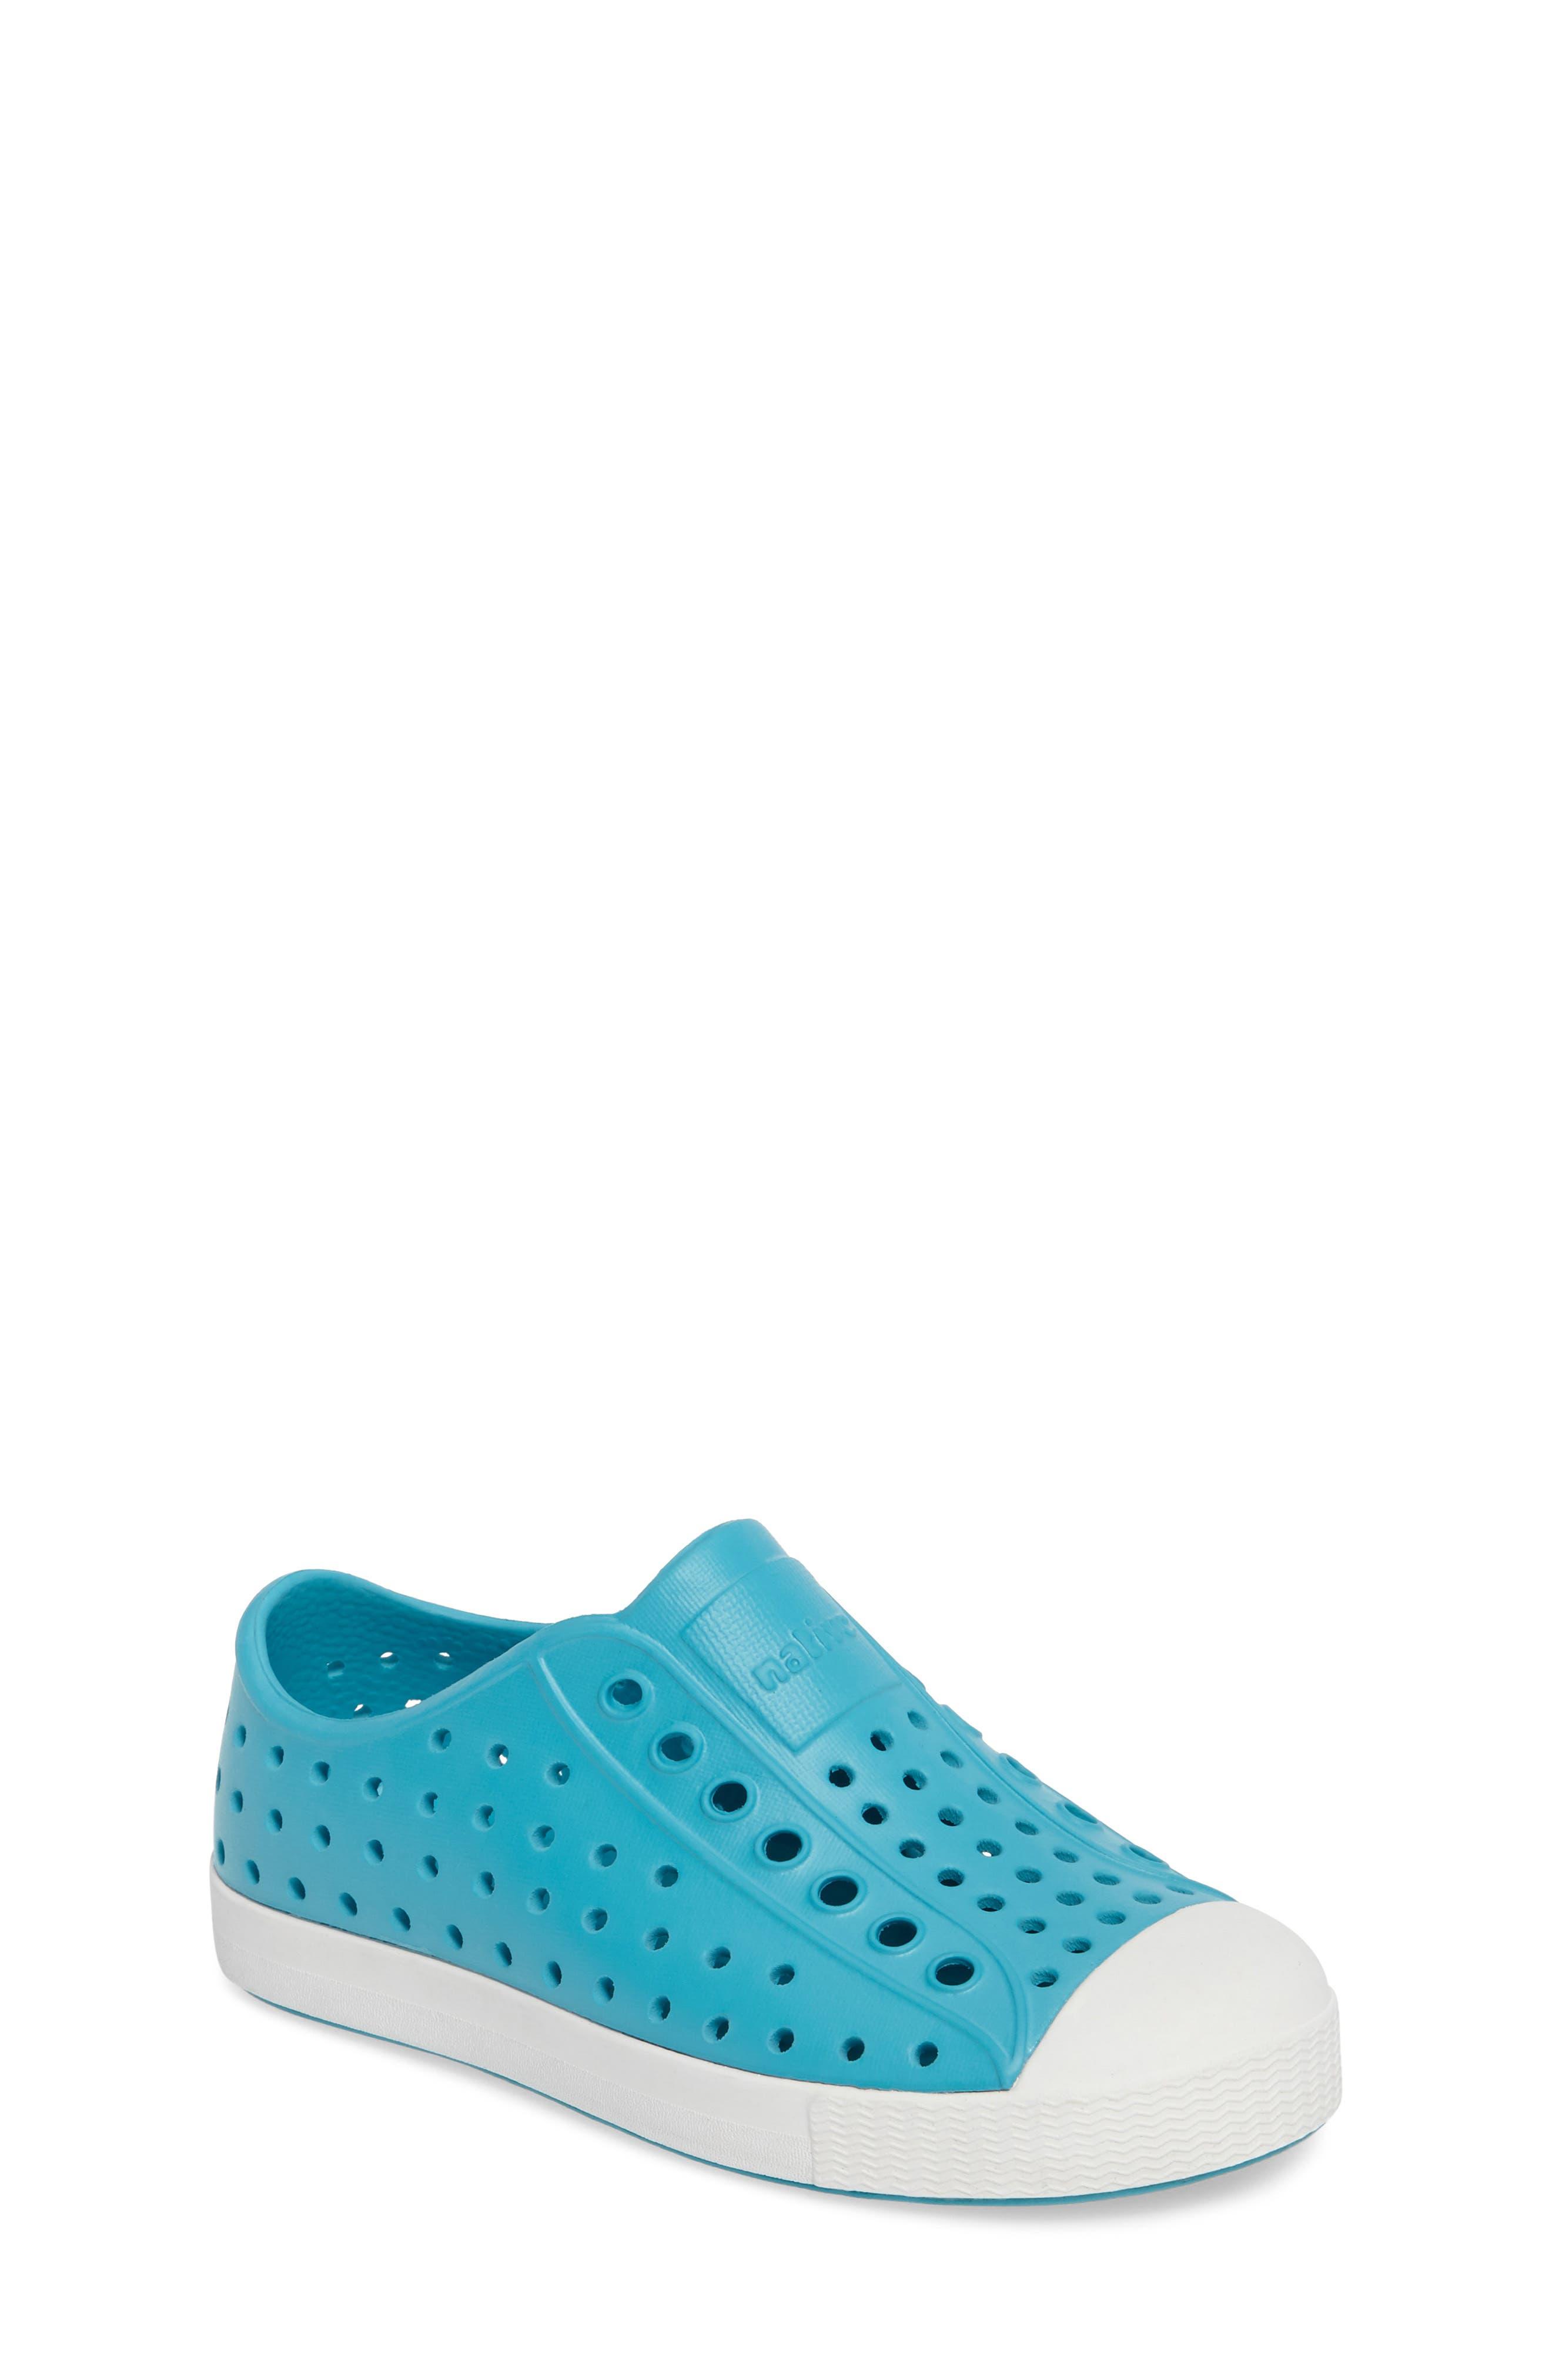 'Jefferson' Water Friendly Slip-On Sneaker,                             Main thumbnail 43, color,